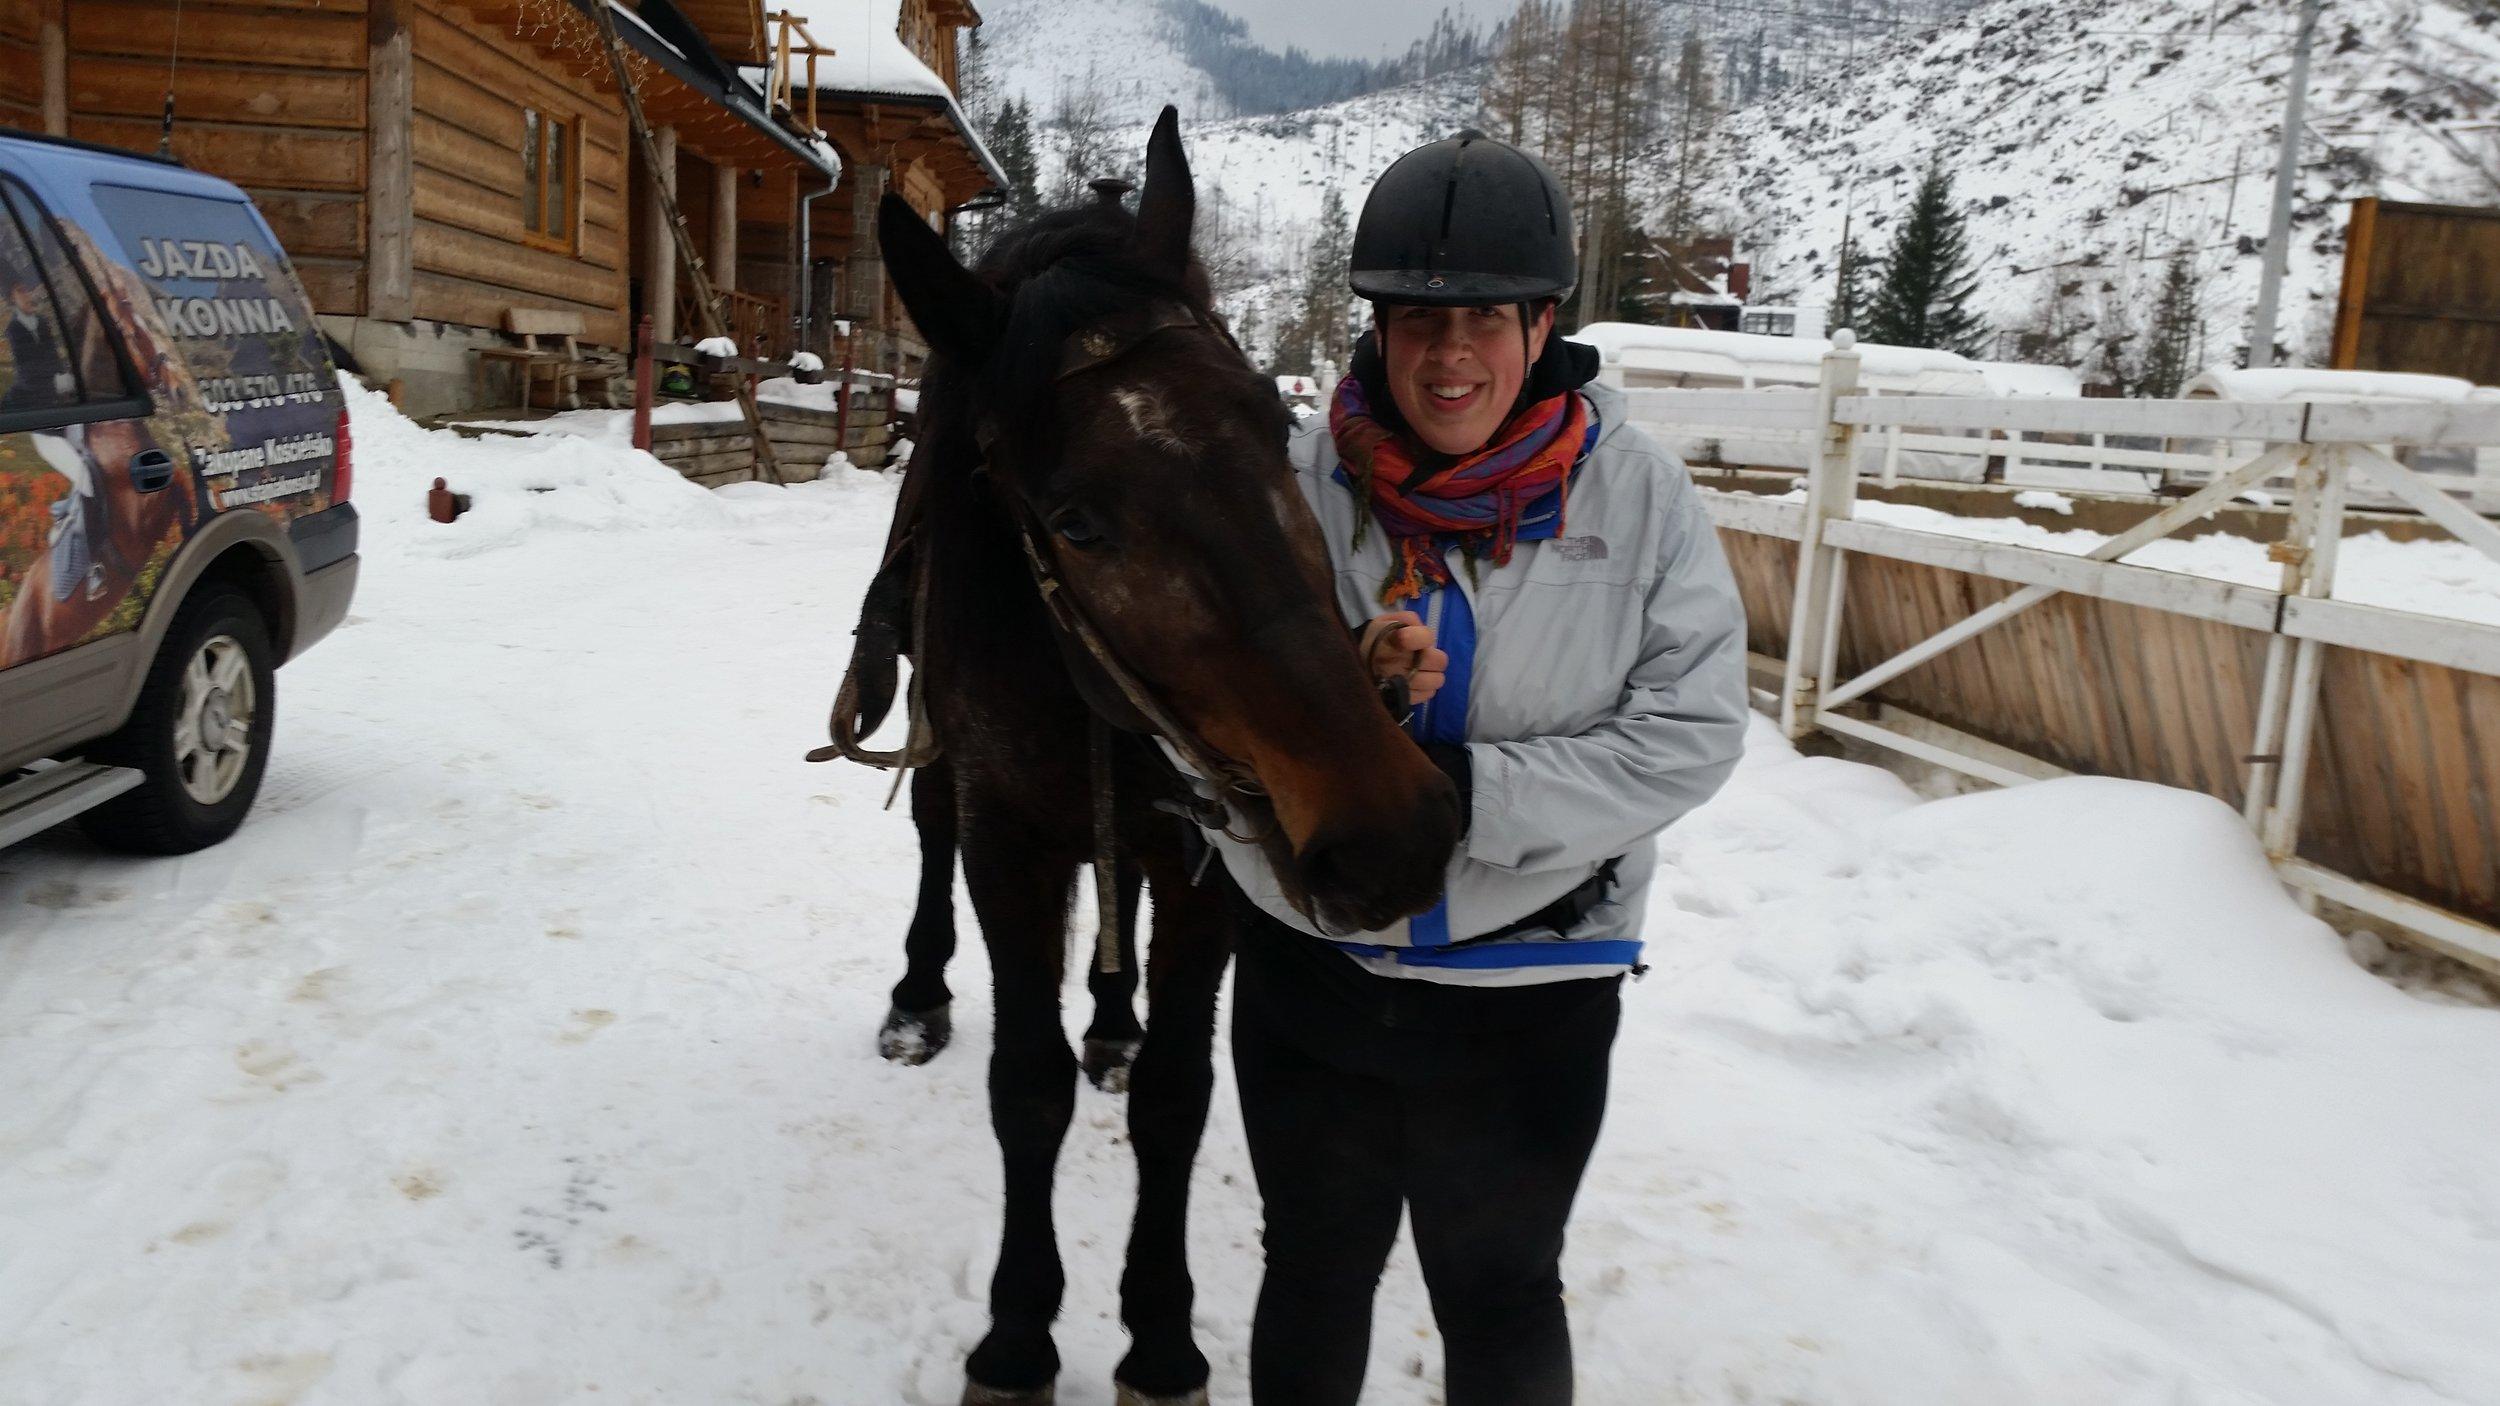 Horseback riding-Tatra Mountains Poland-2015.jpg